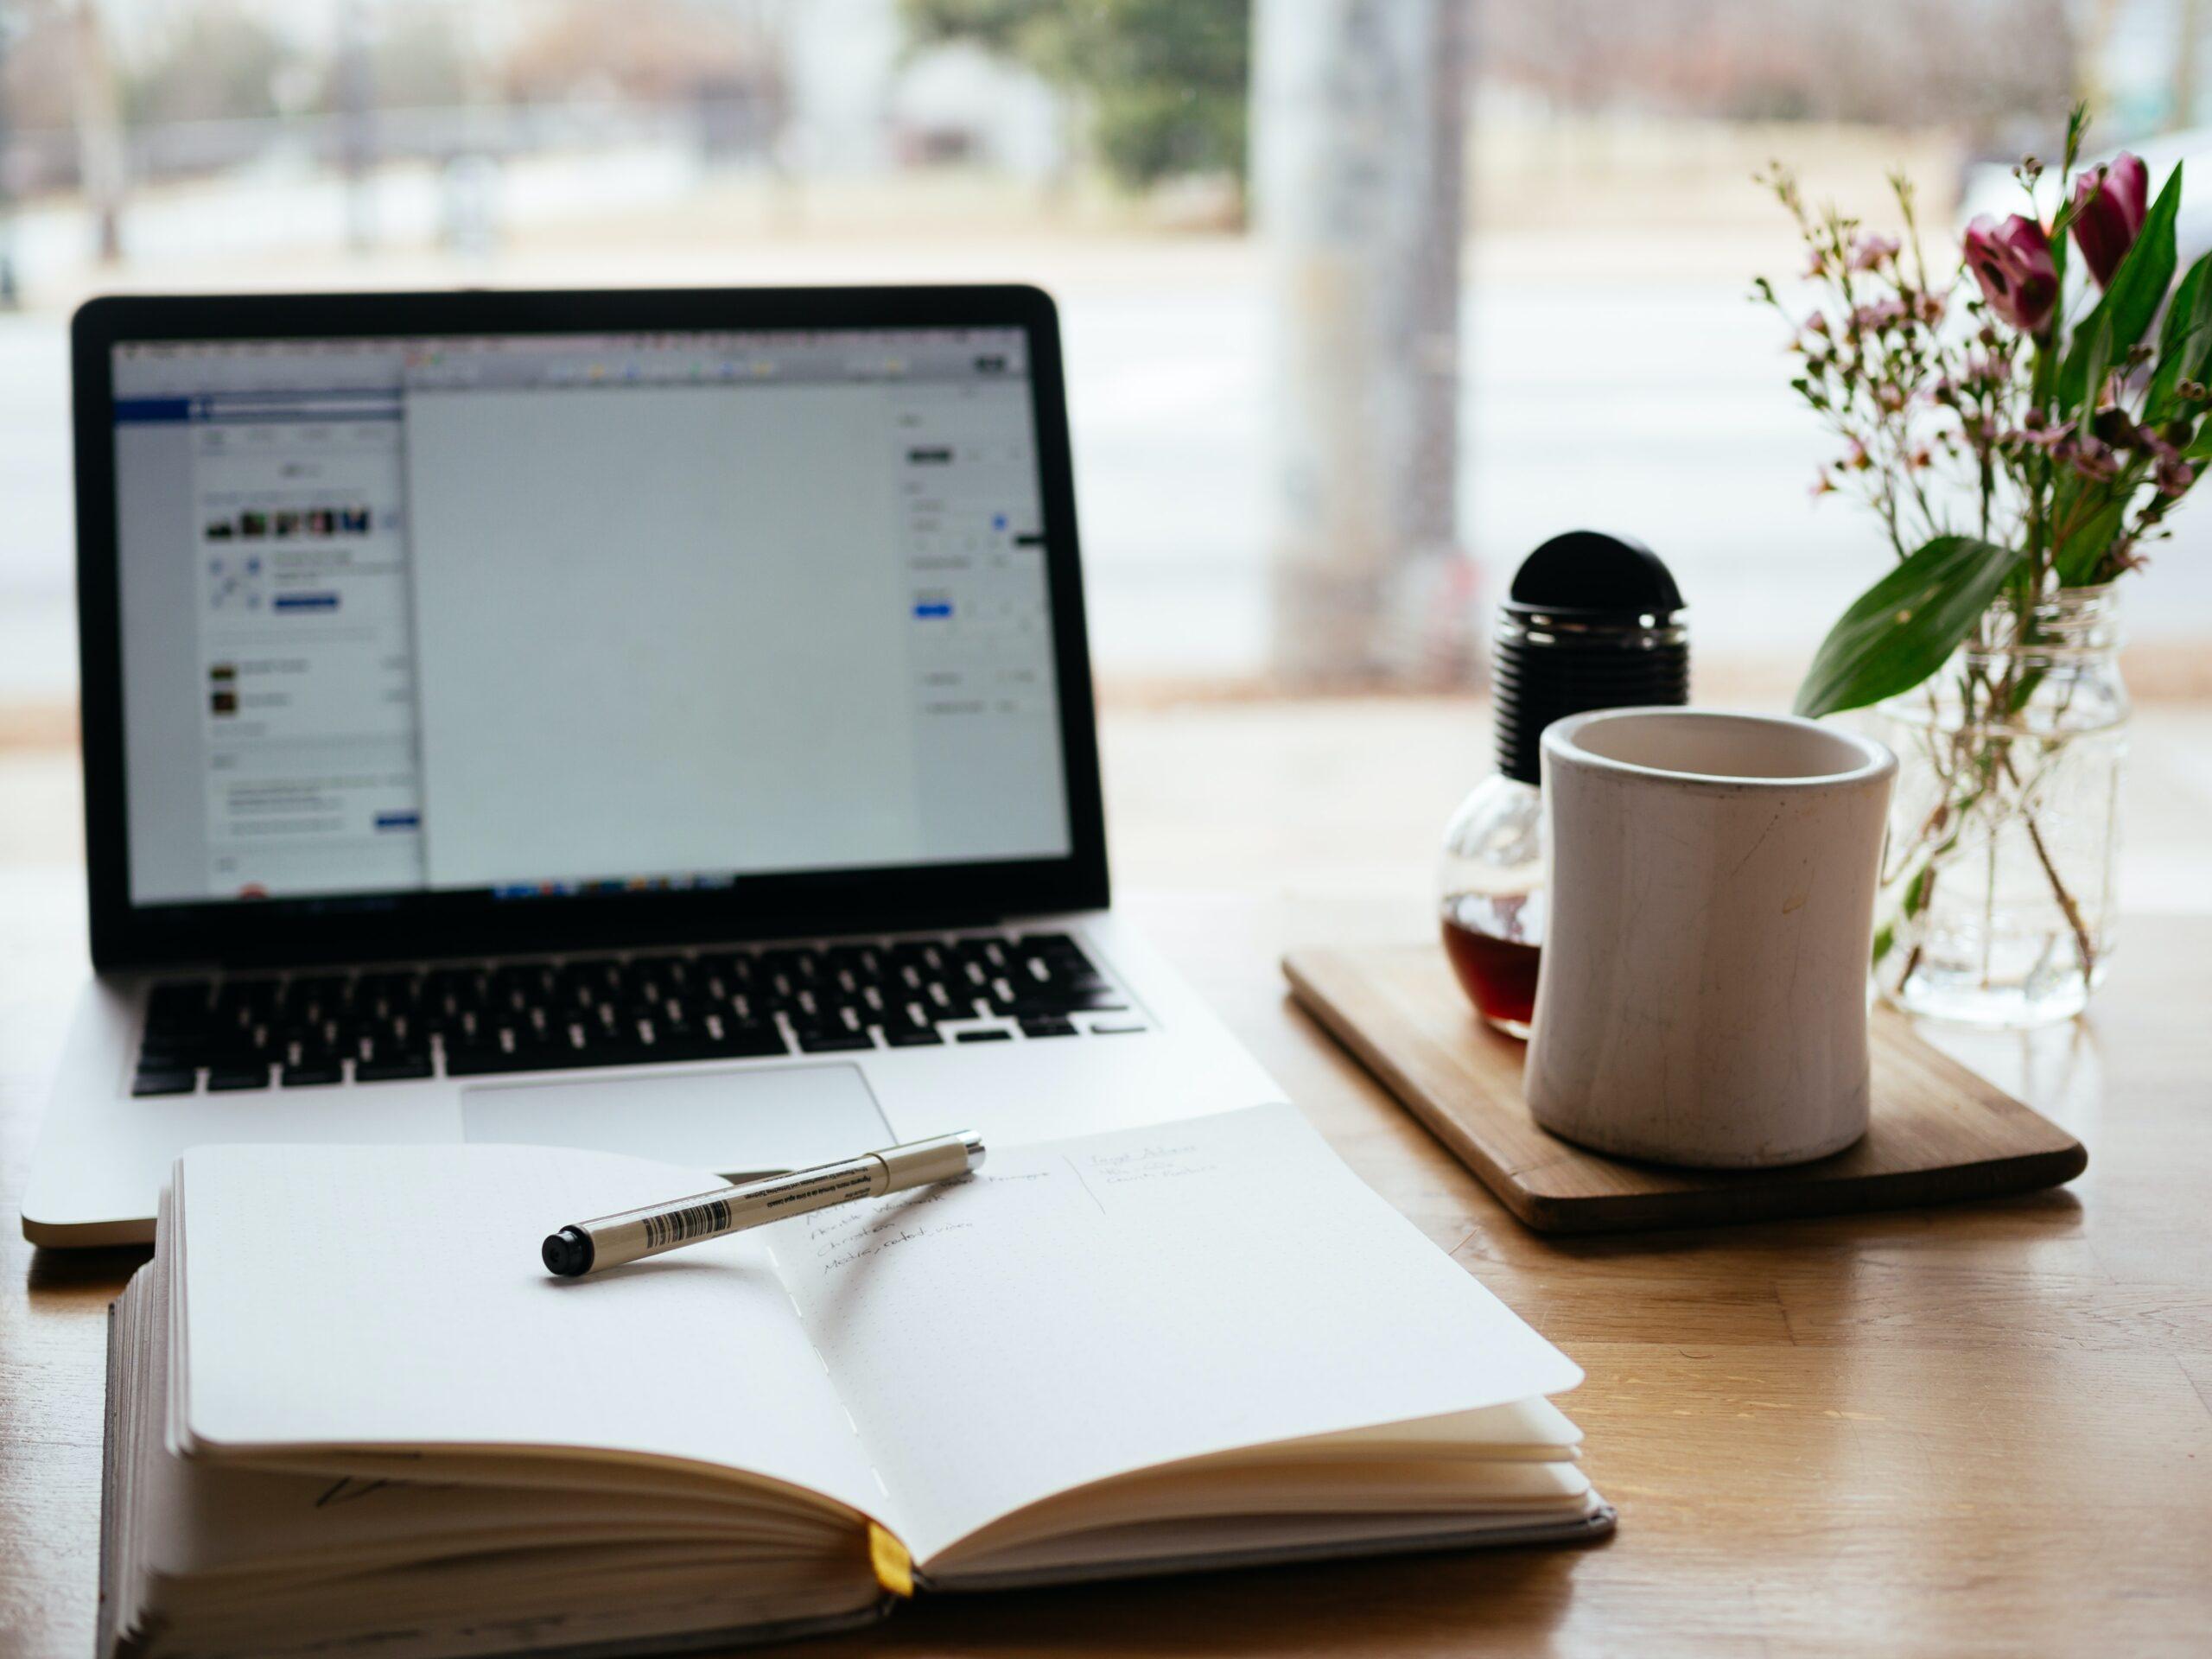 Best Online Courses to Jumpstart your Entrepreneurial Career